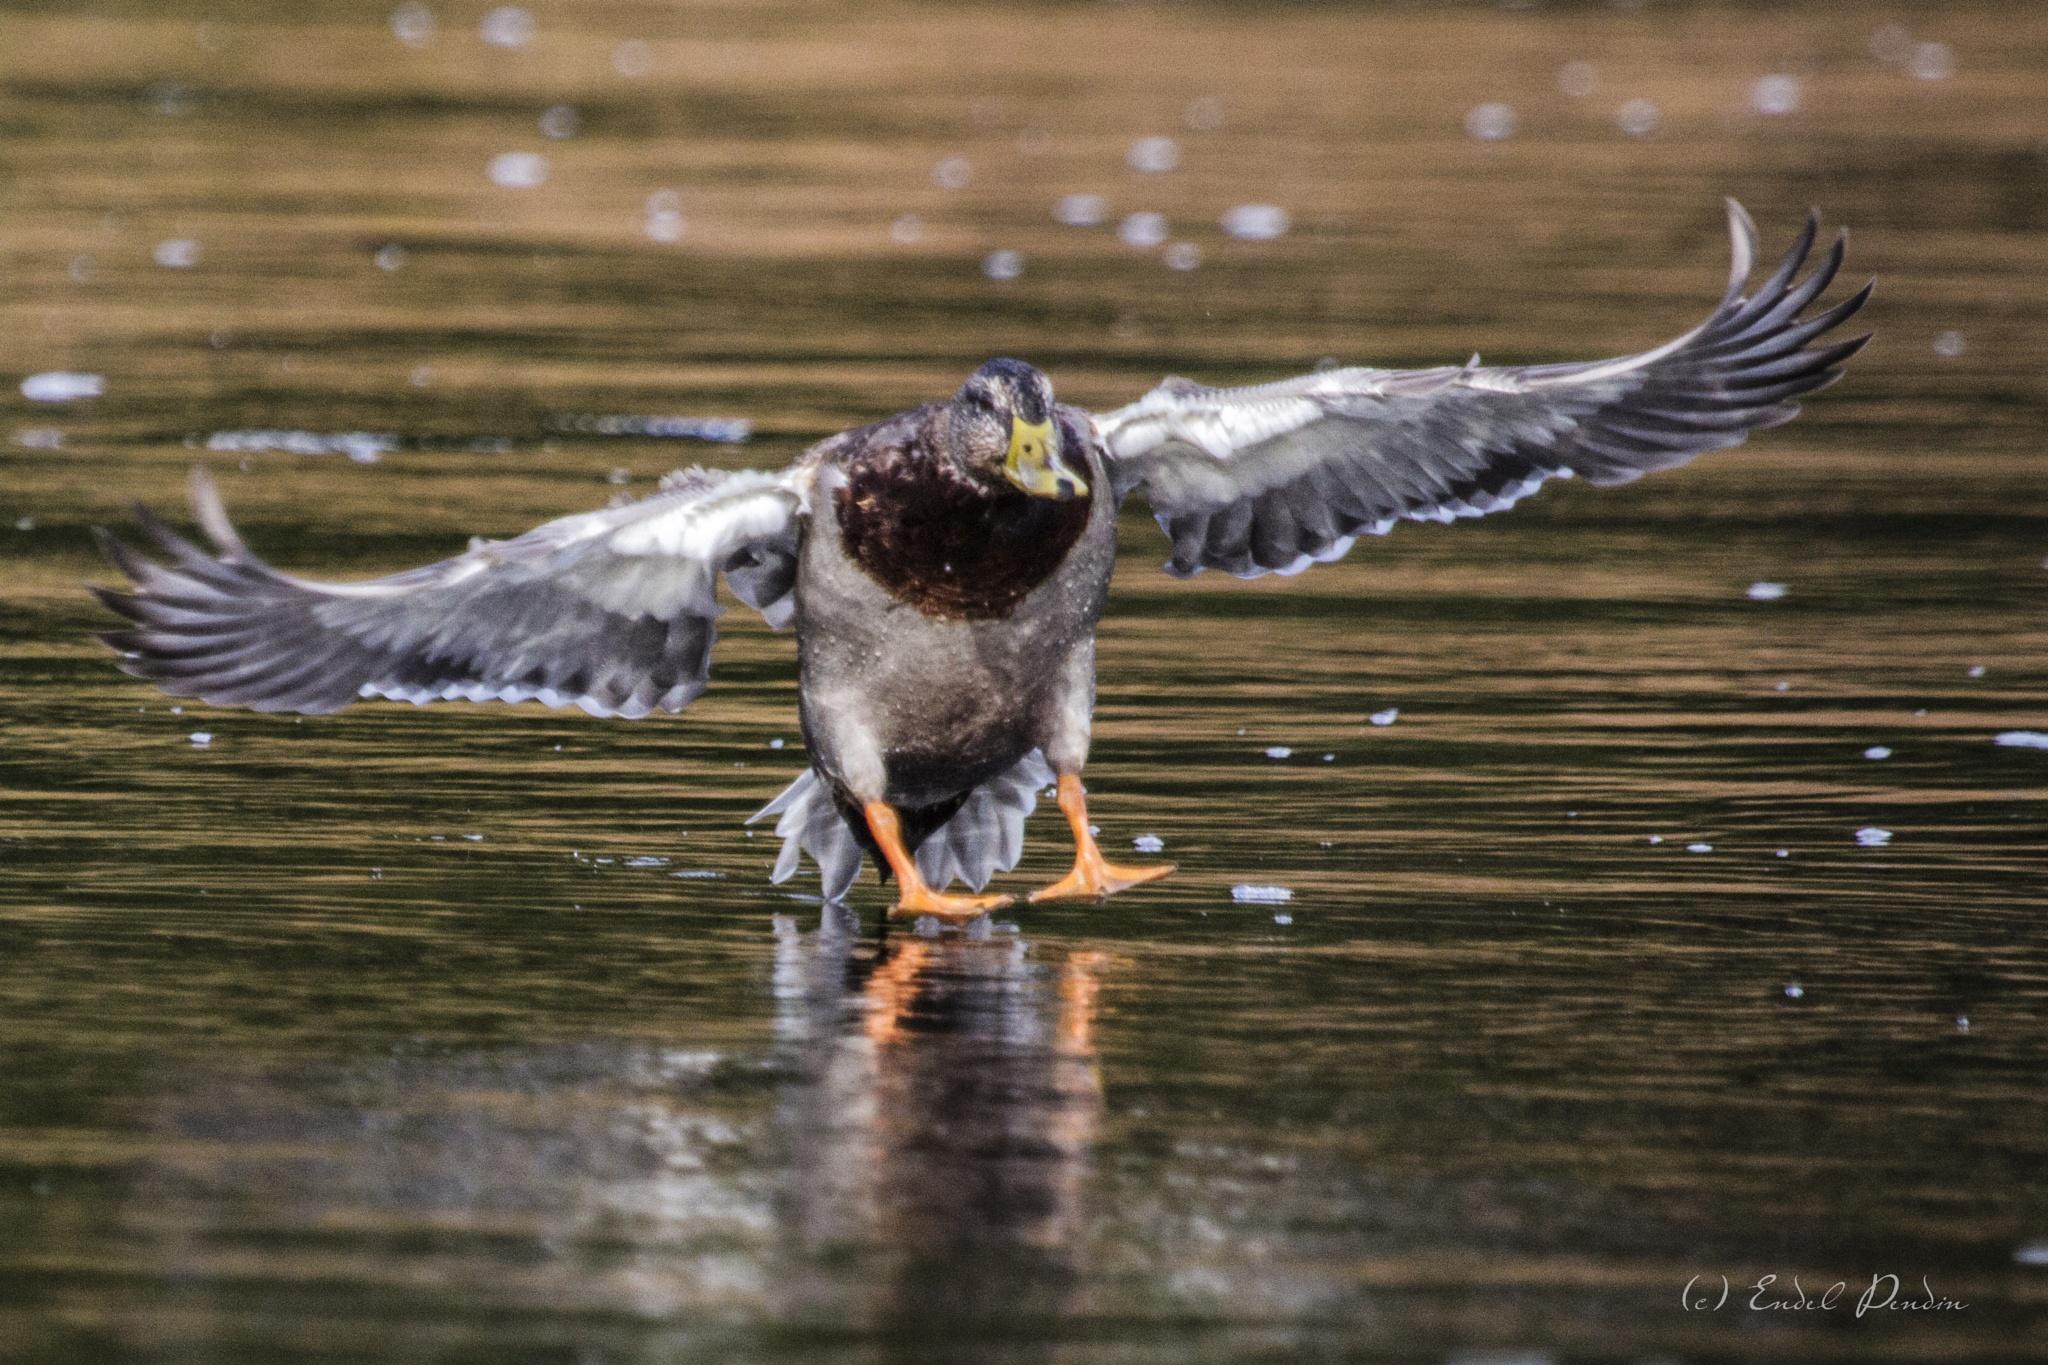 The mallar or wild duck (Anas platyrhynchos) by sarvikpytt